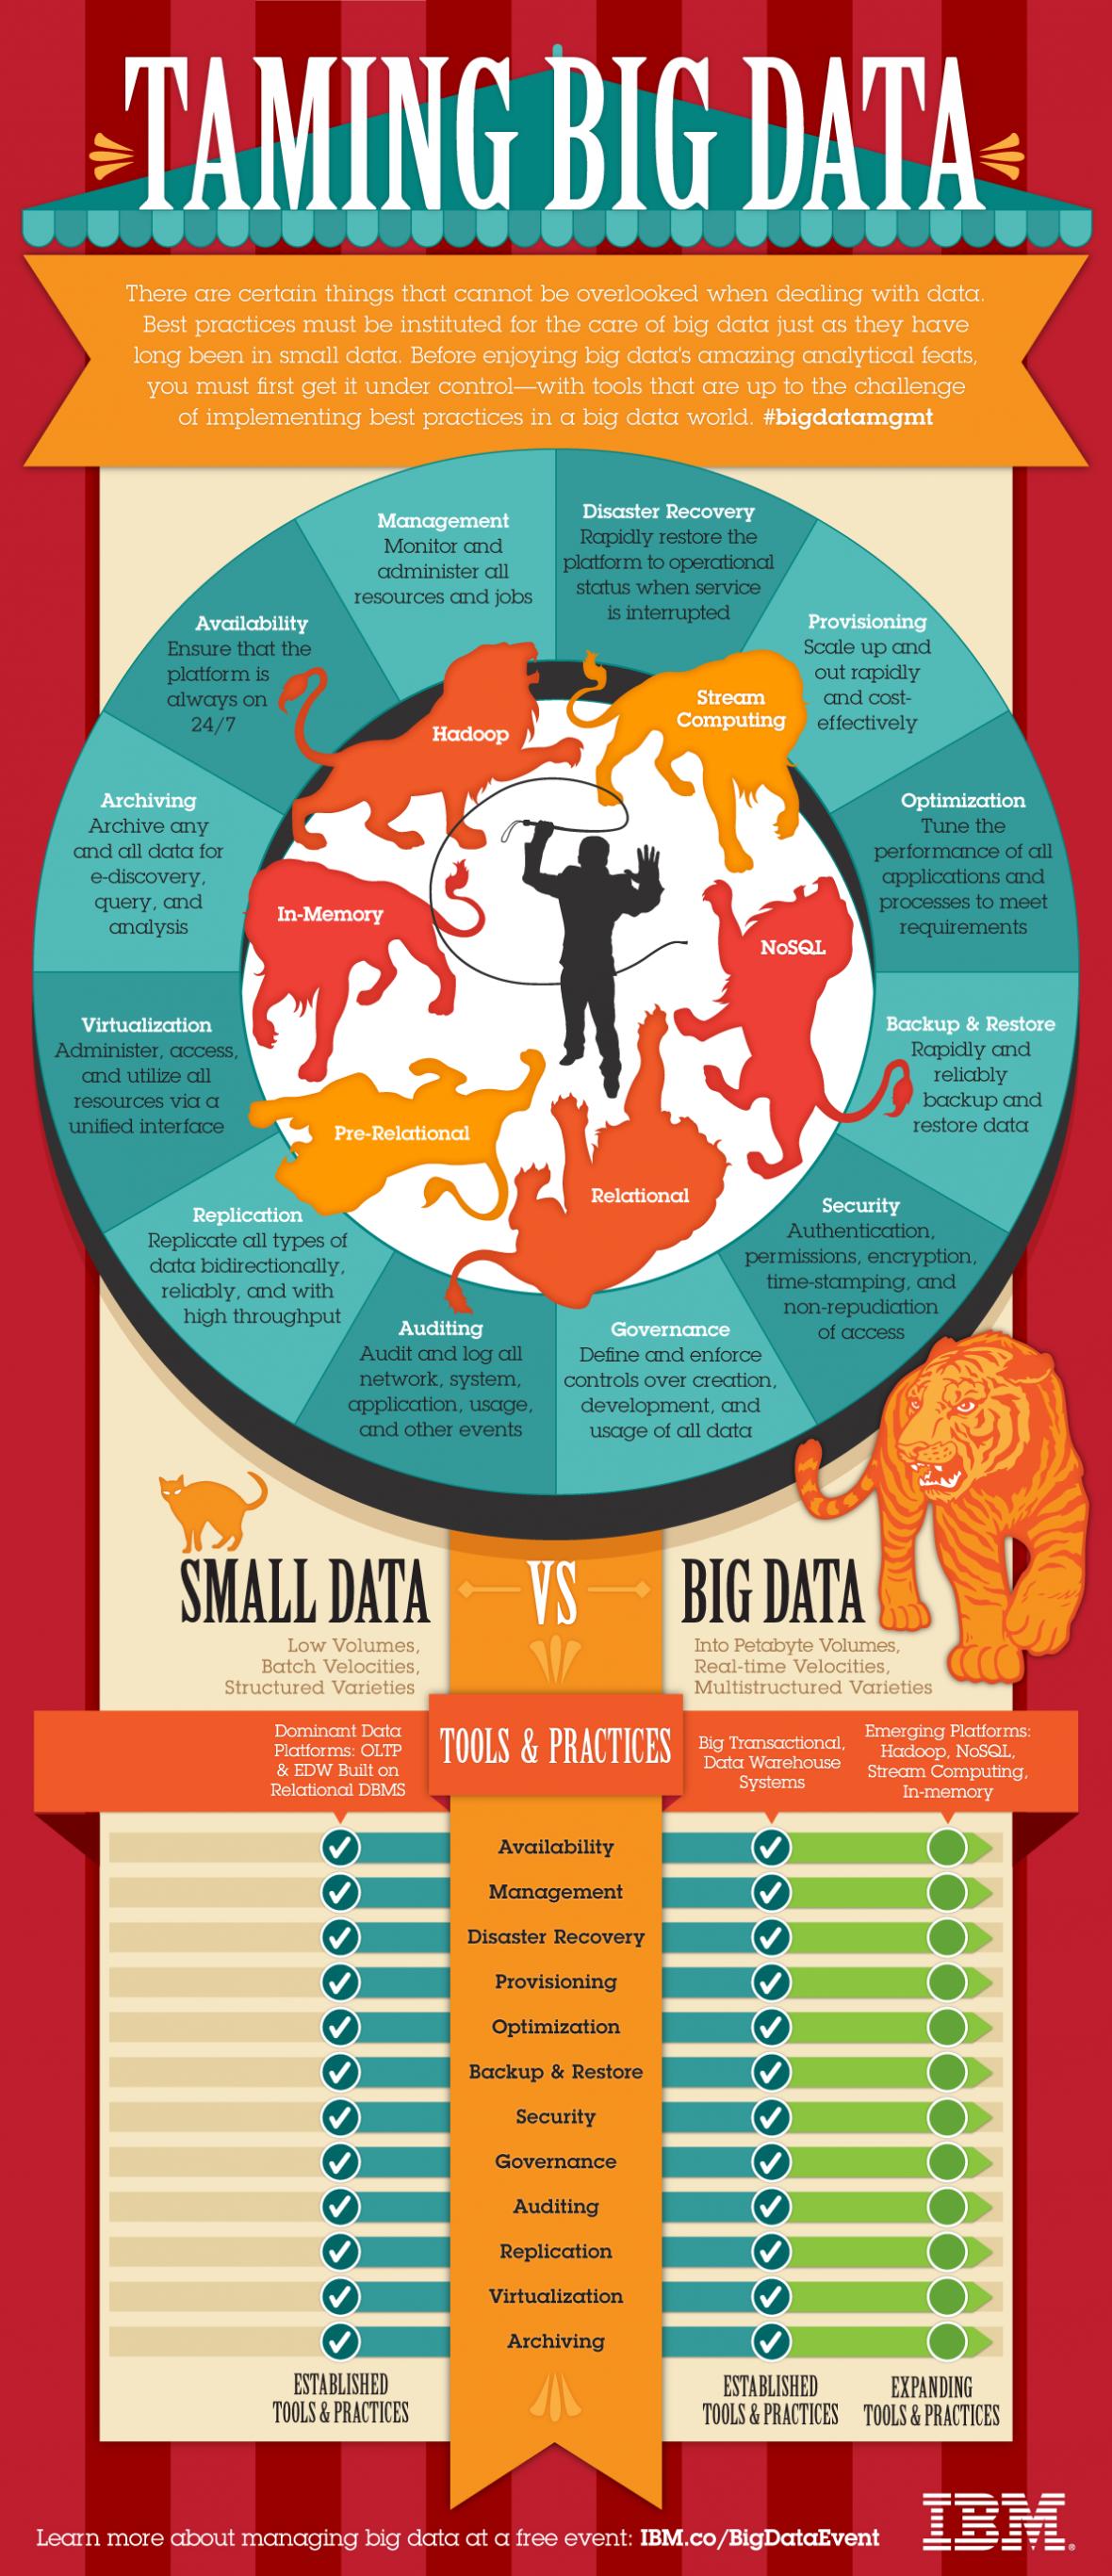 Little Data Instead of Big Data